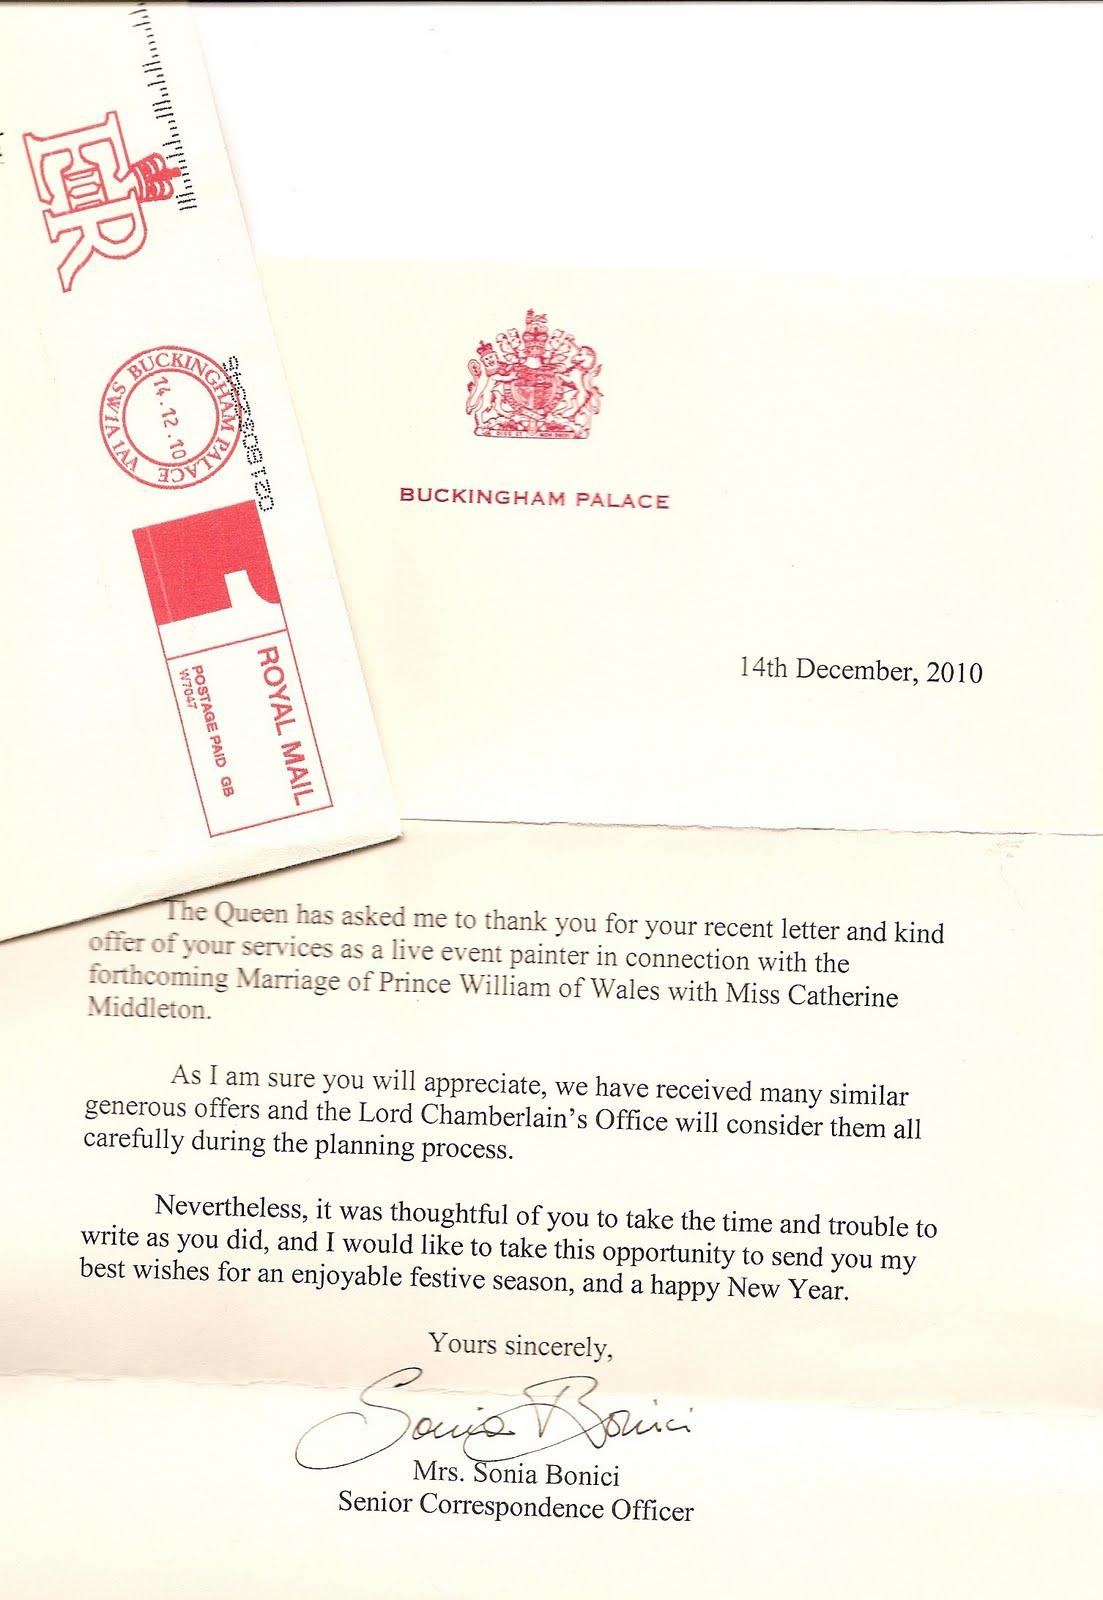 Royal Wedding Correspondence